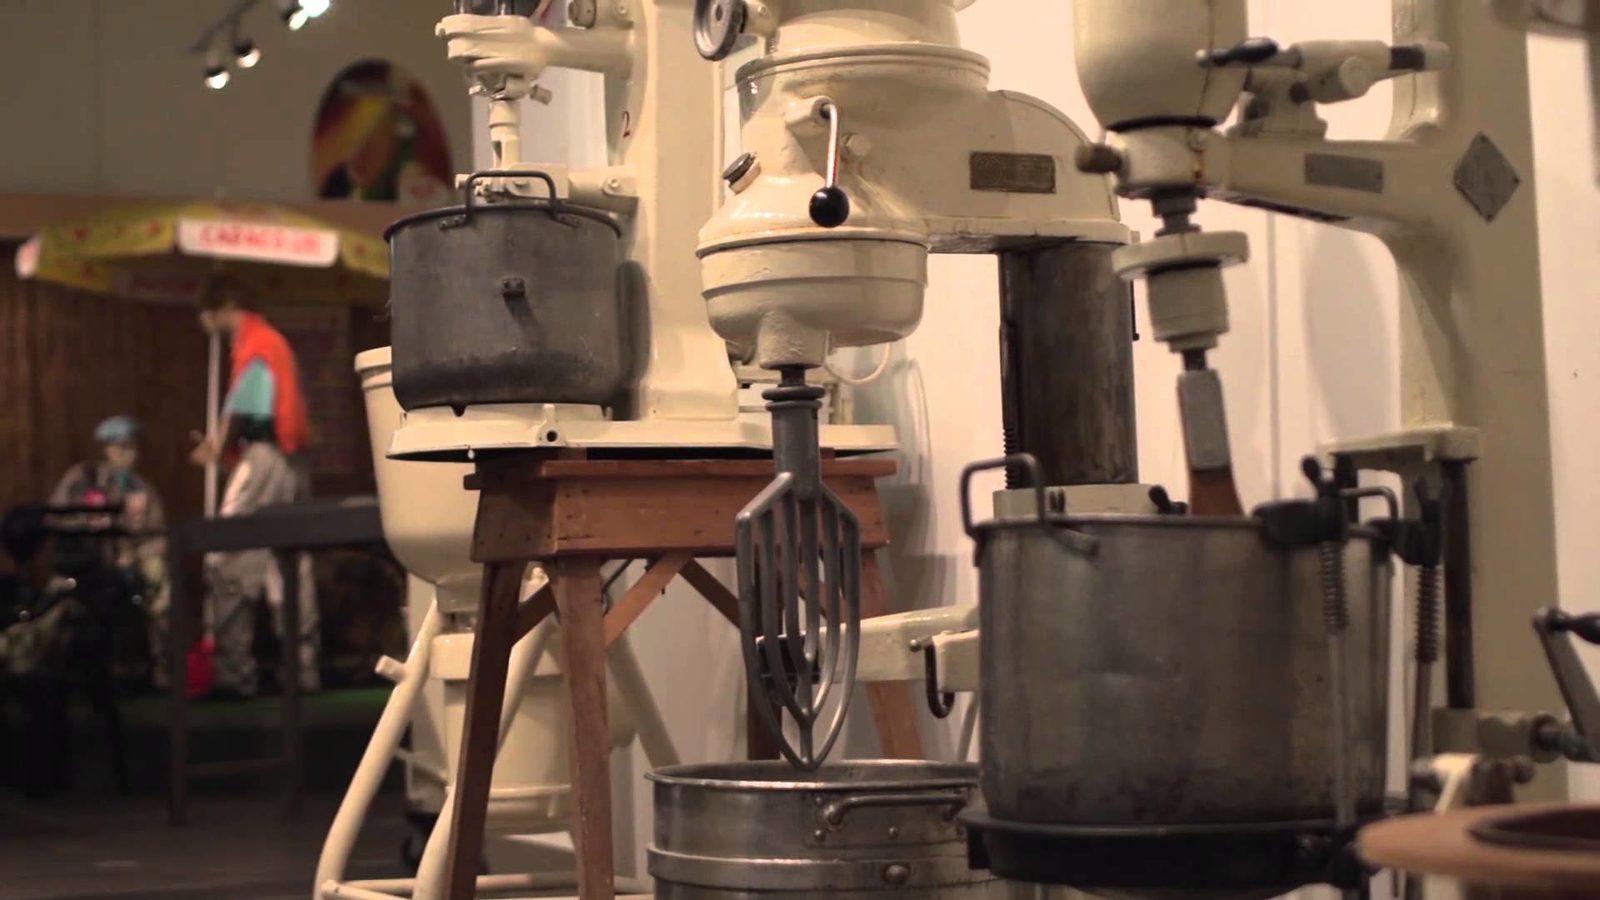 Bakery and Ice Cream Museum